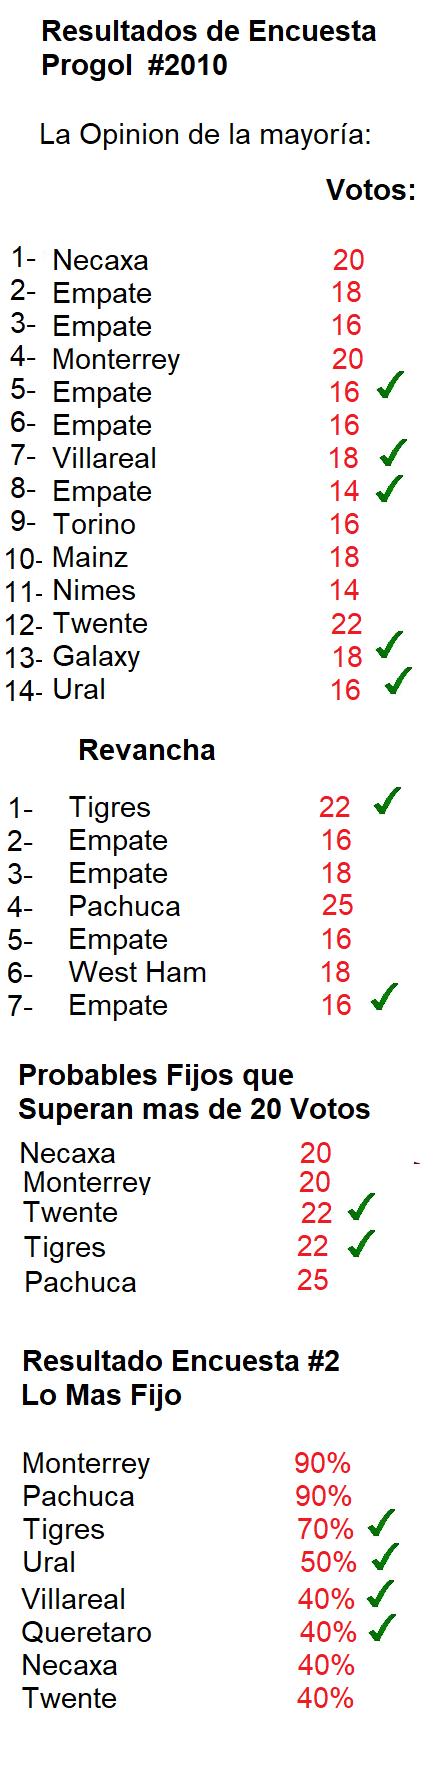 Resultado-Encuesta-Progol-2010